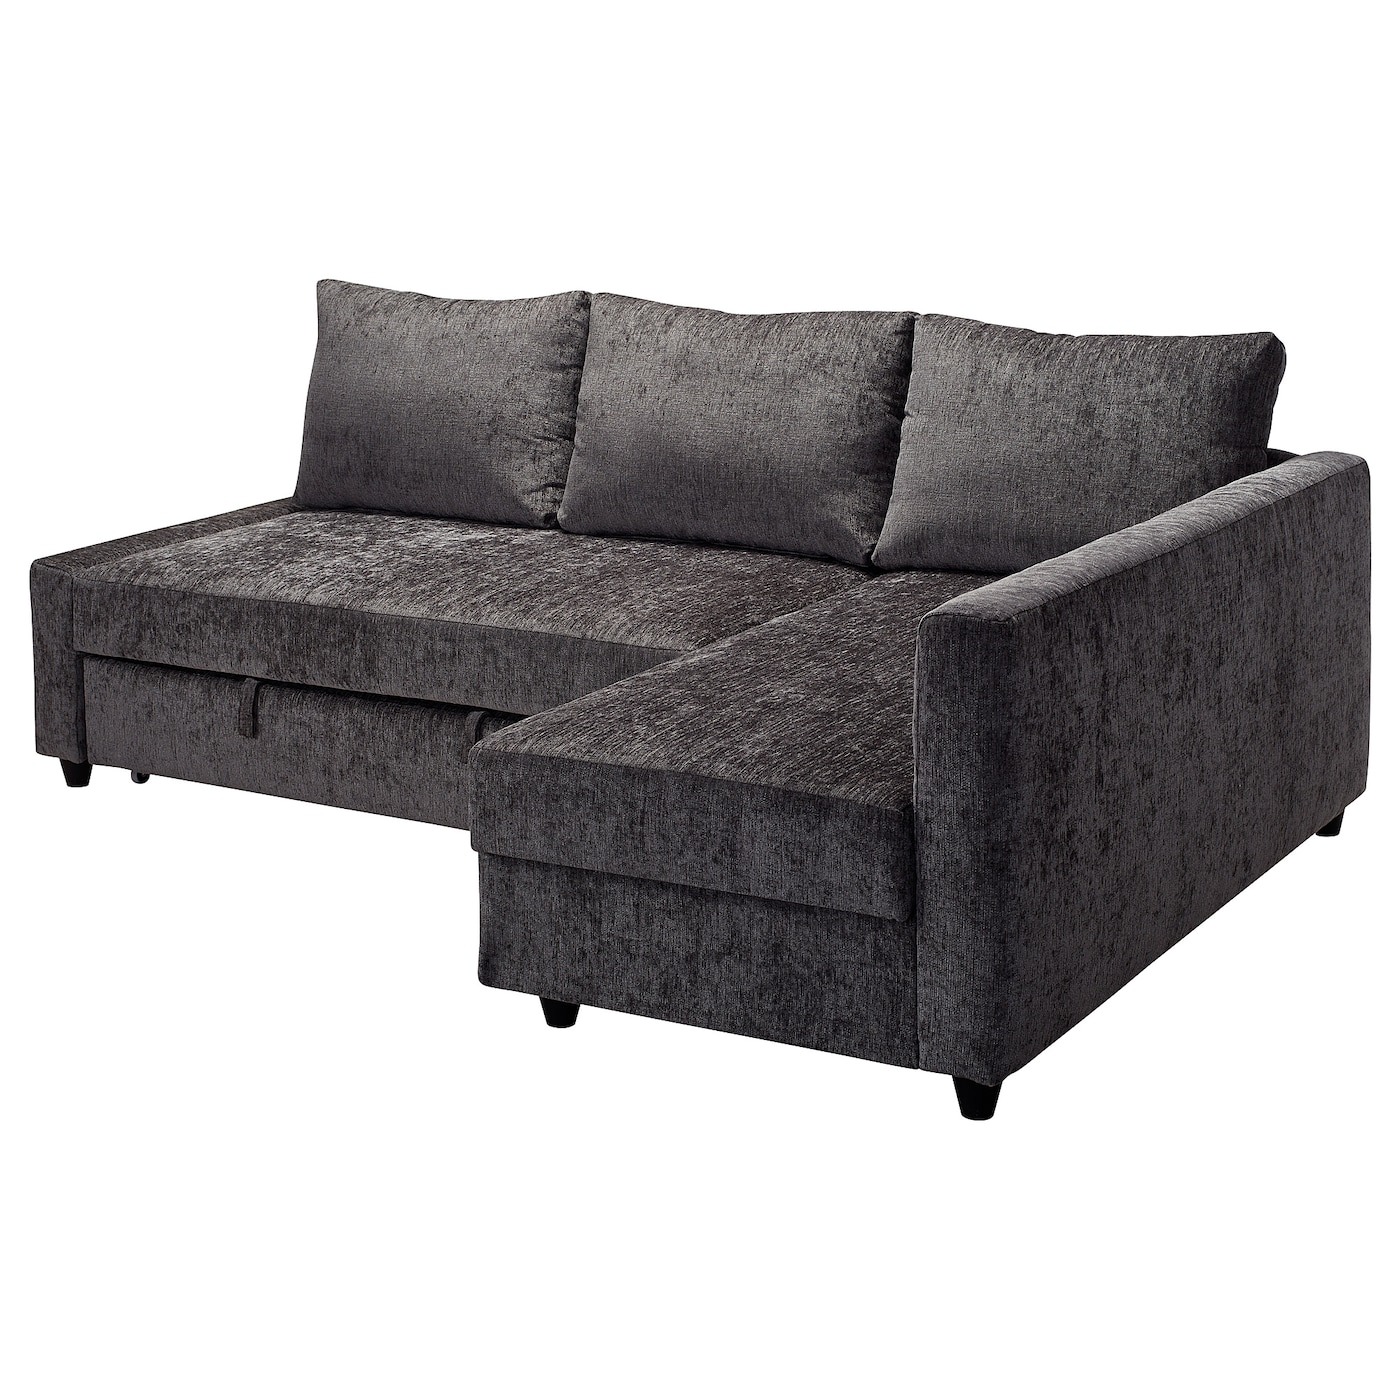 FRIHETEN Corner sofa-bed with storage Dark grey - IKEA